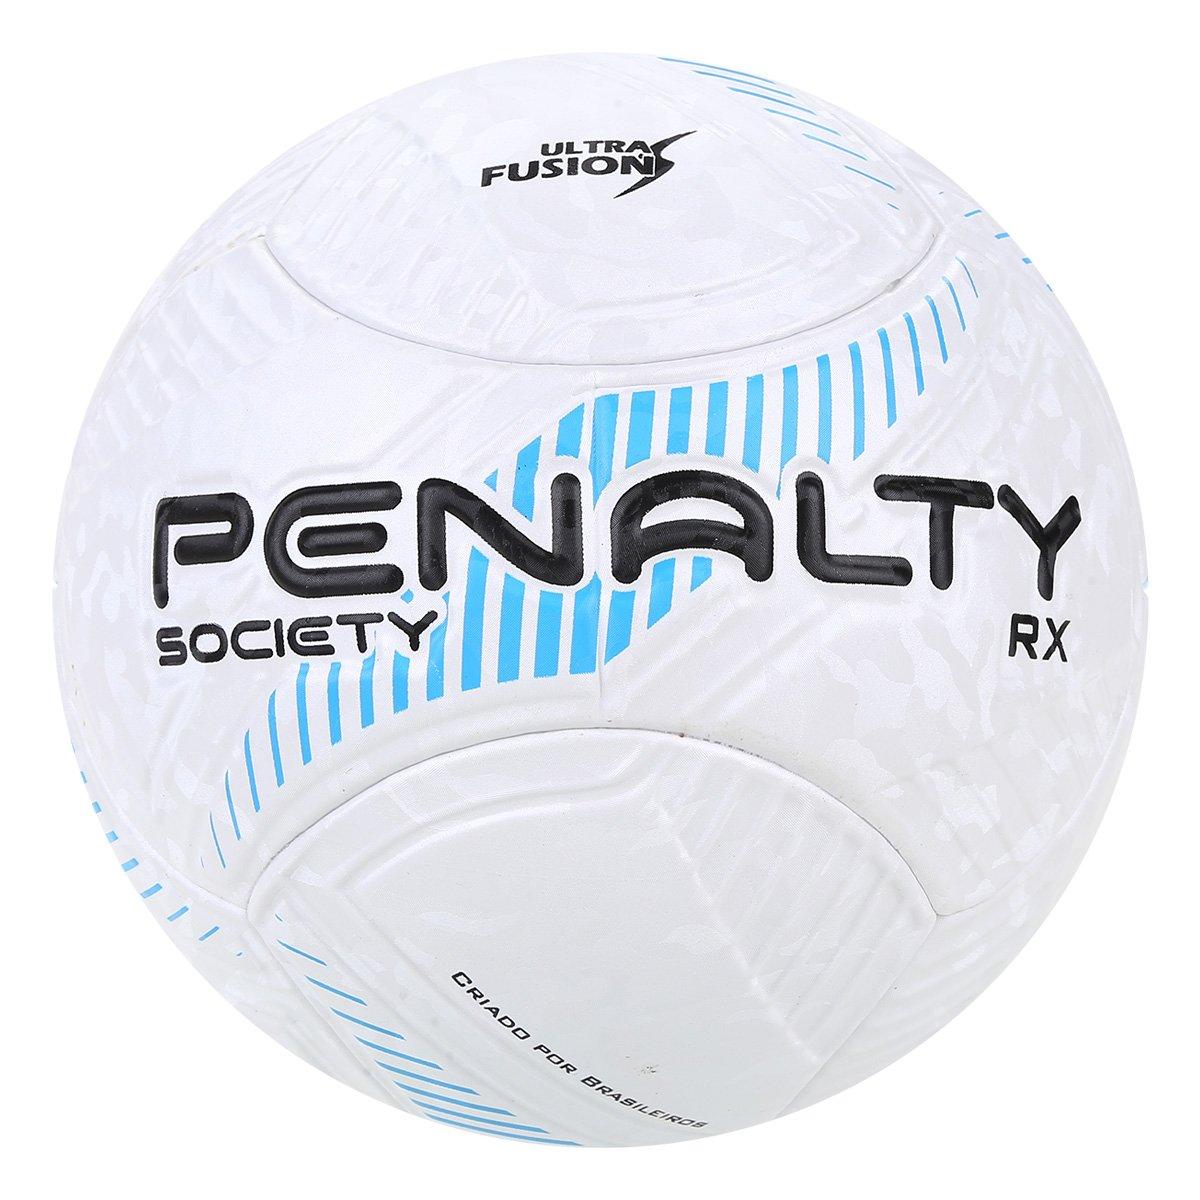 Bola de Futebol Society Penalty RX Fusion VIII . fcec5ca8c24b2